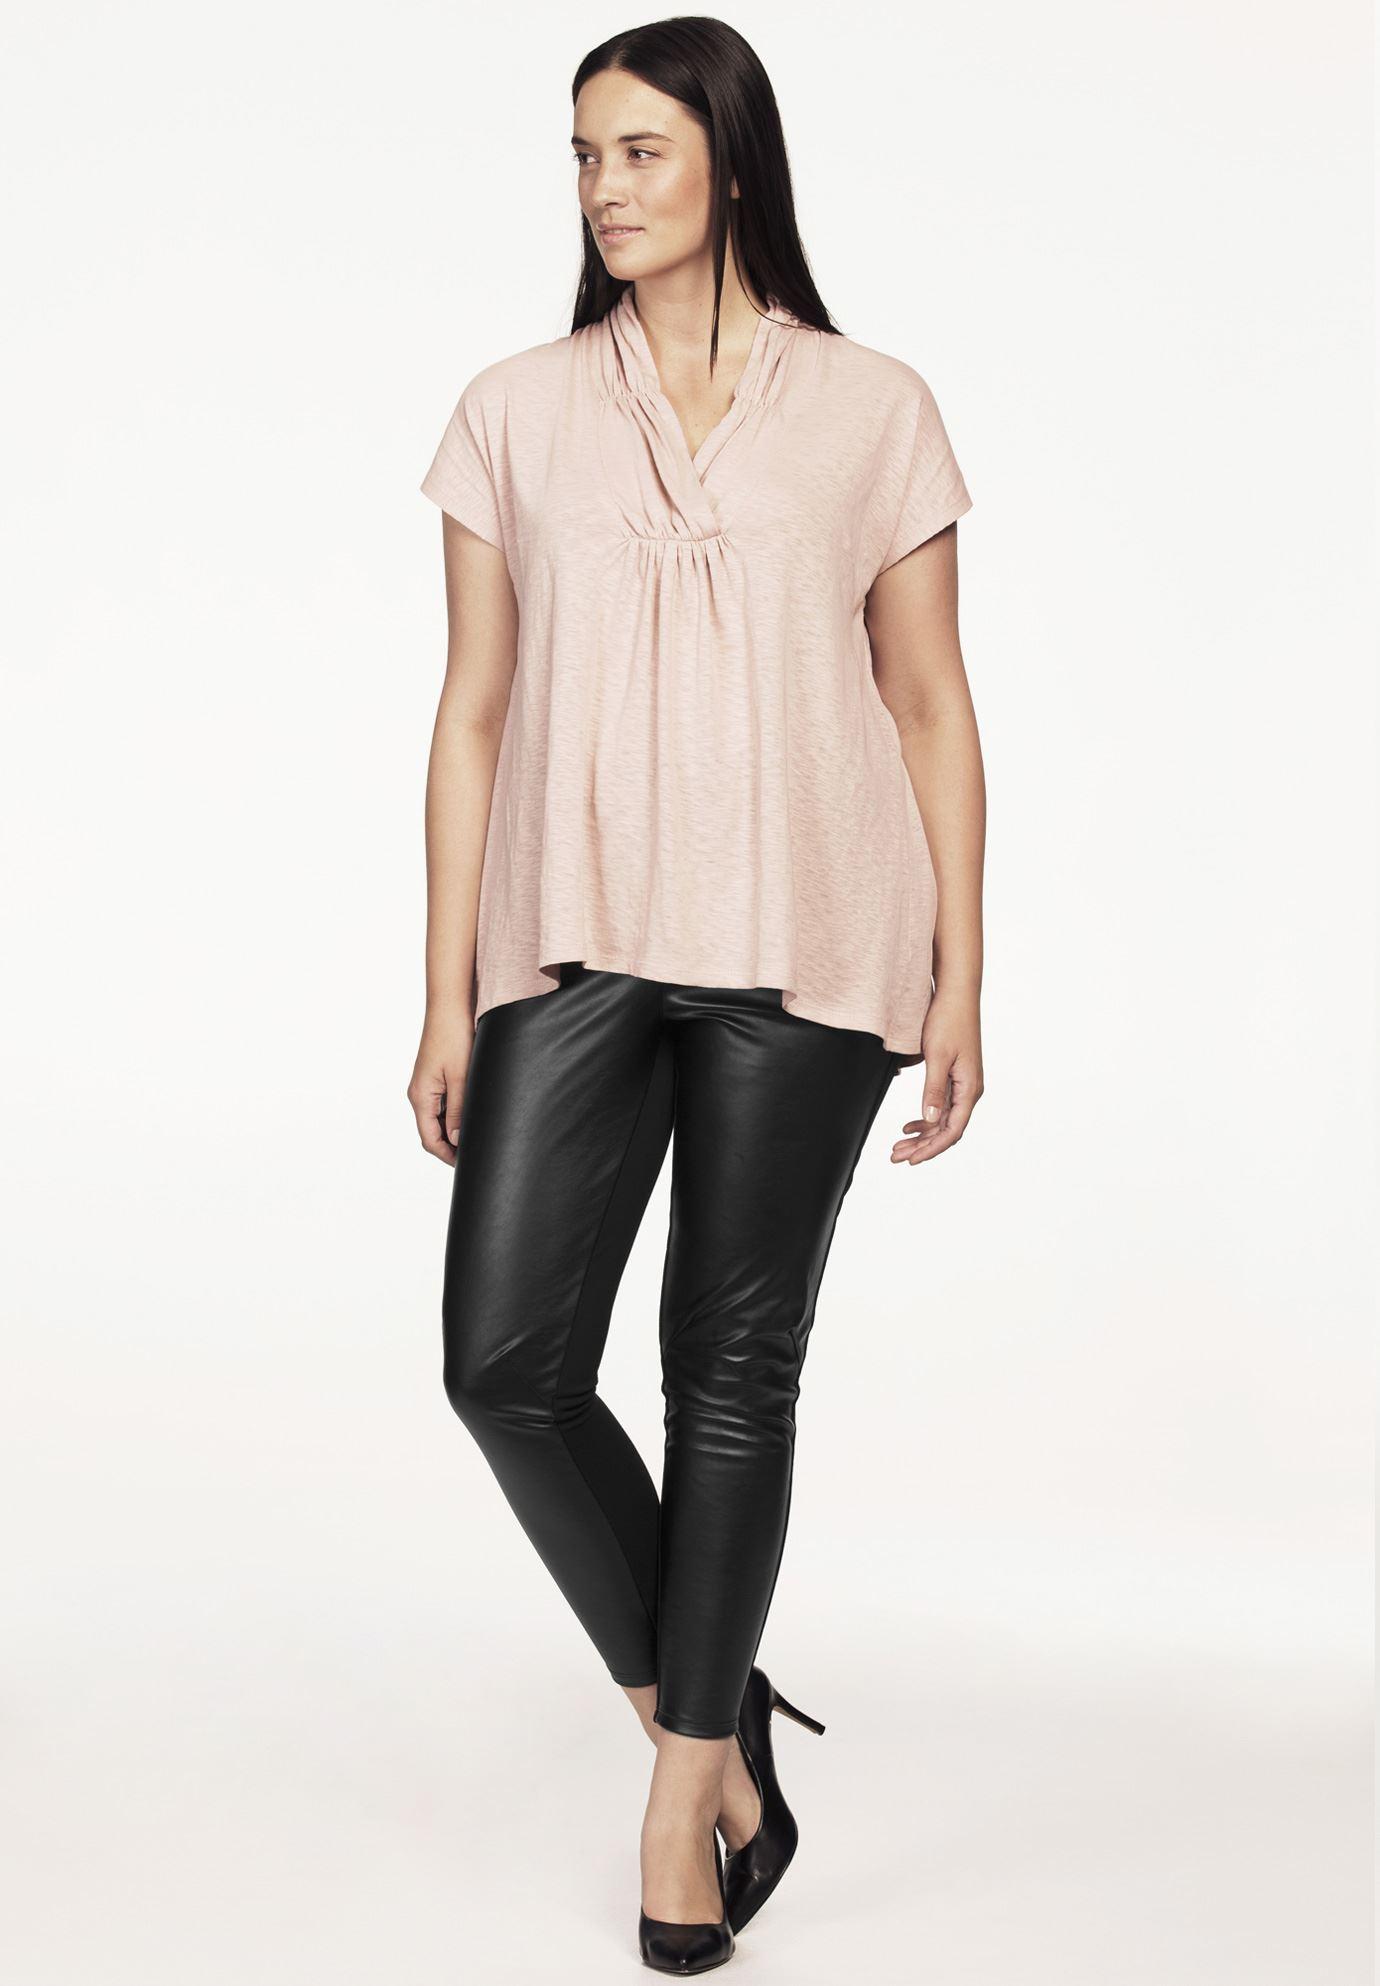 Swedish clothing stores online